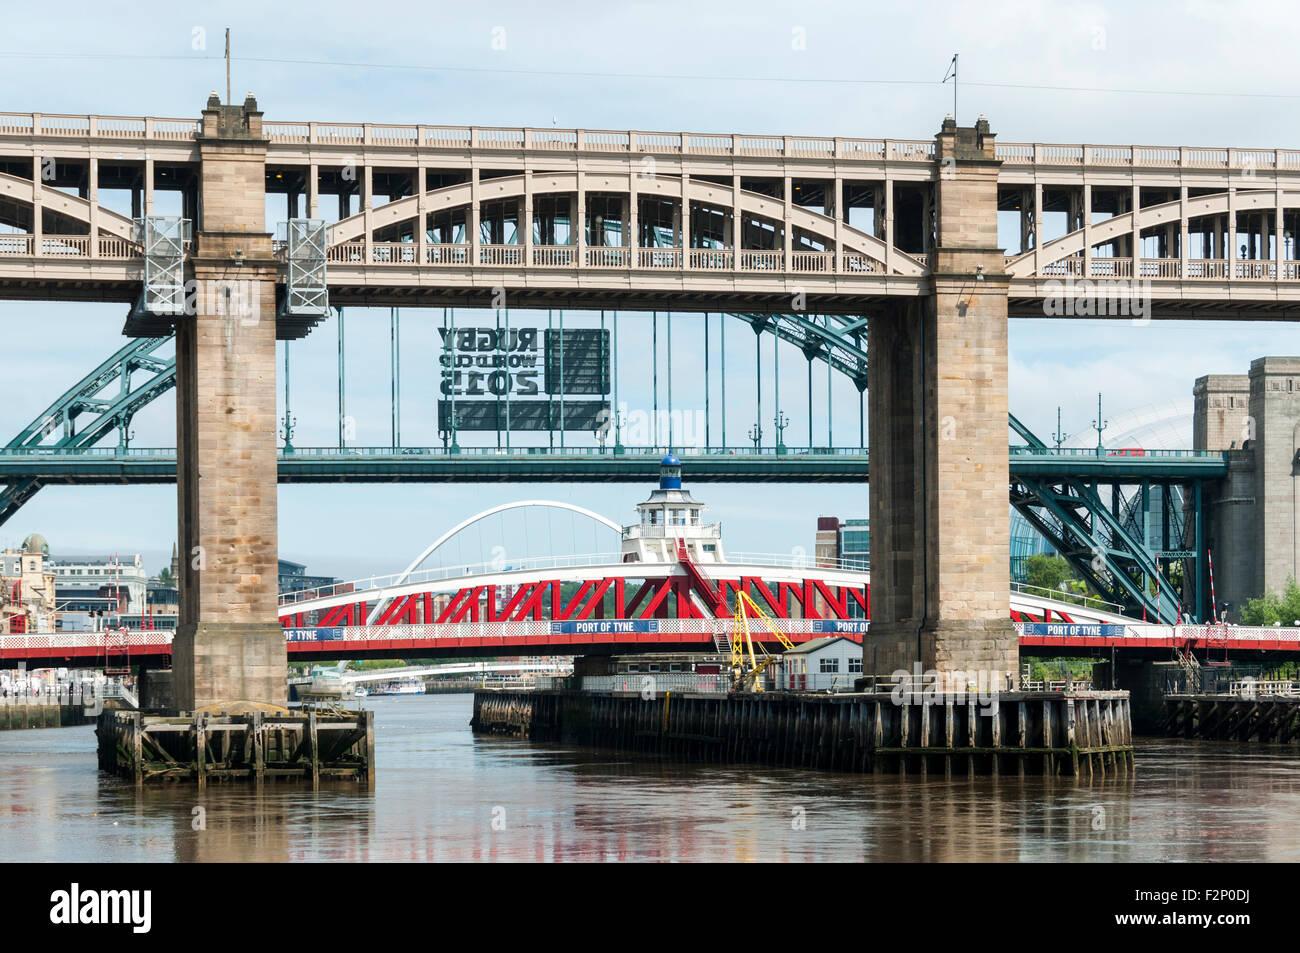 The High Level, Tyne and Swing bridges over the river Tyne, Newcastle-Gateshead, Tyne and Wear, England, UK. - Stock Image